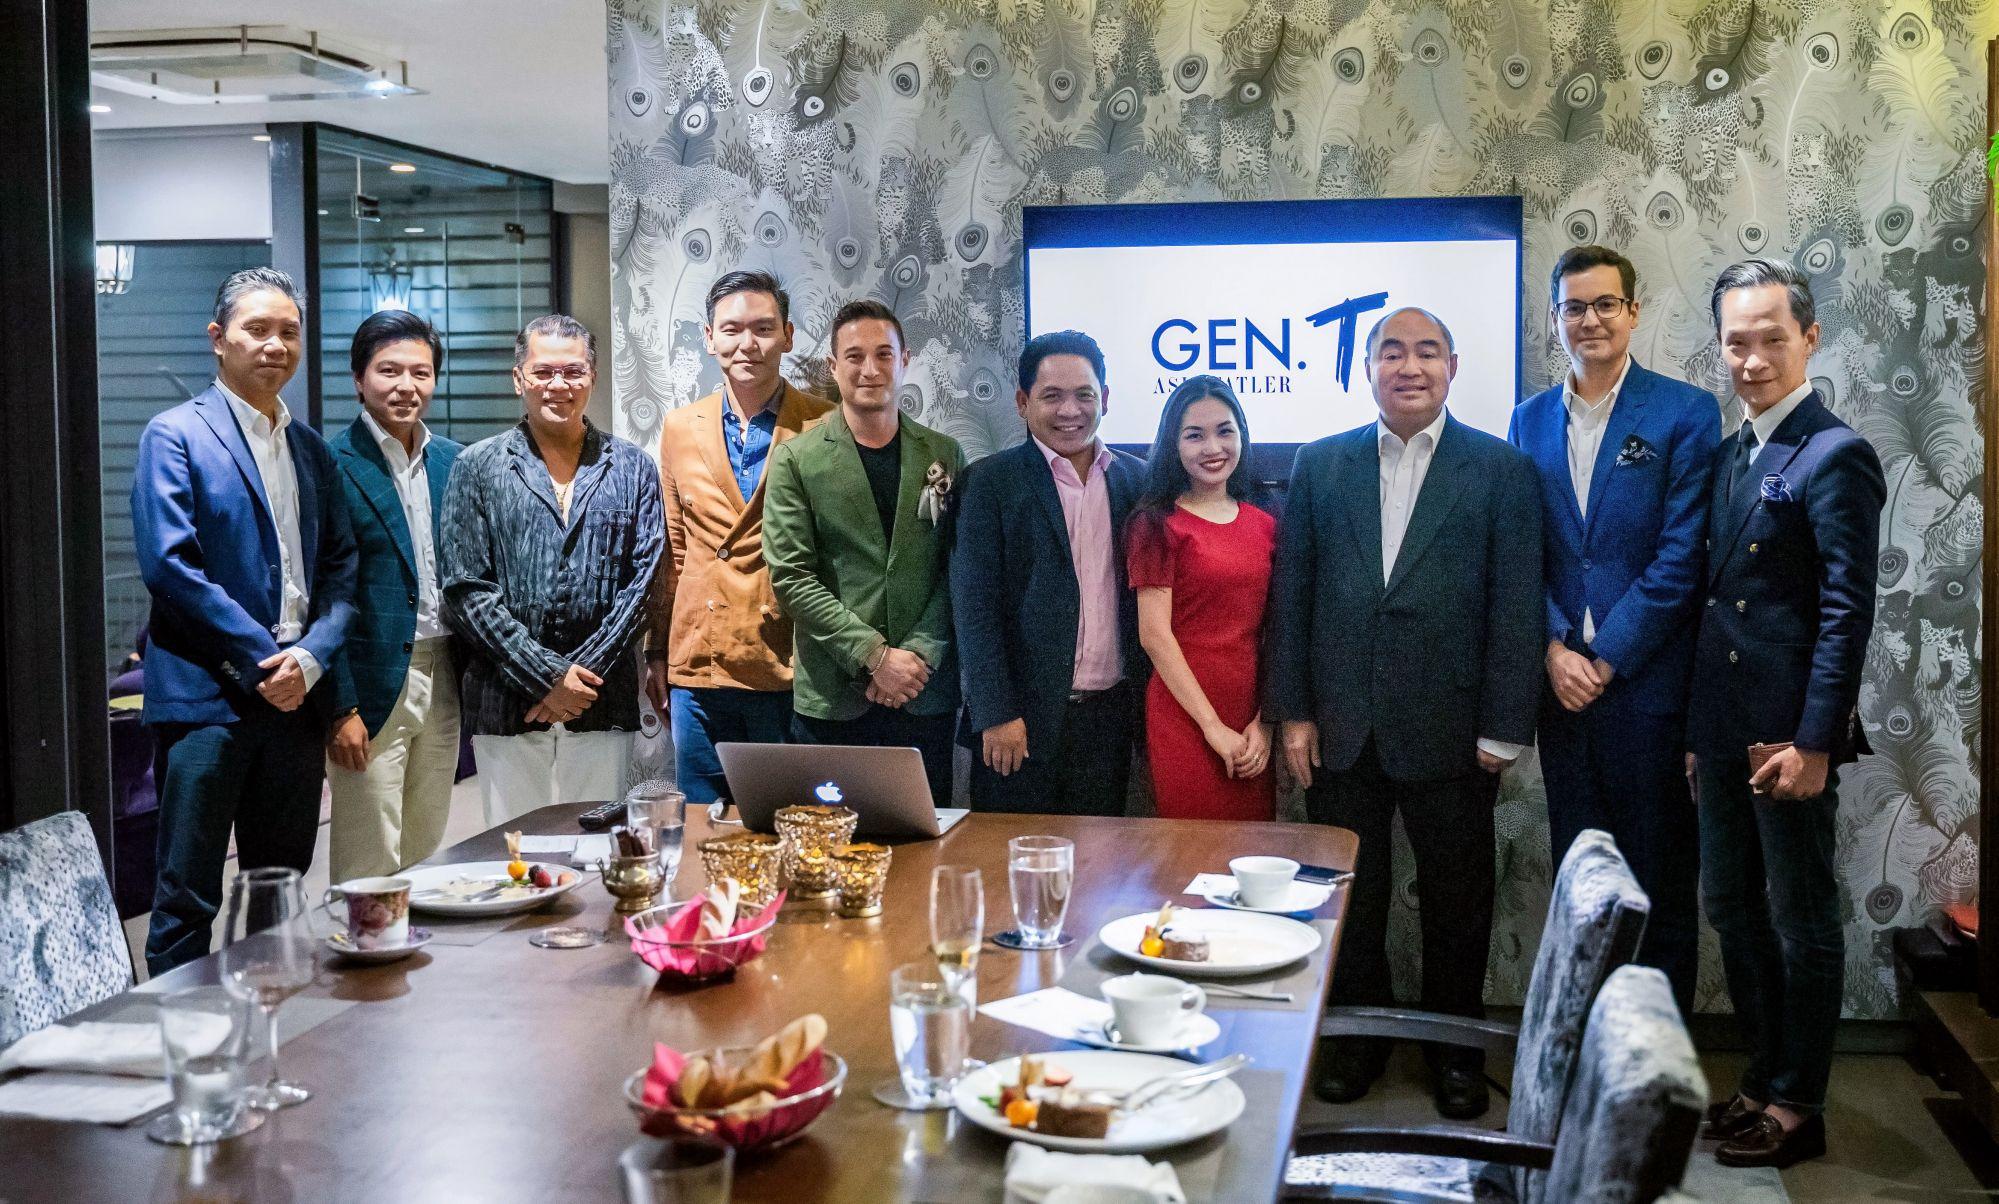 Generation T Asia editor Lee Williamson and Thailand Tatler's Mika Apichatsakol with the Thailand Tatler Tribe